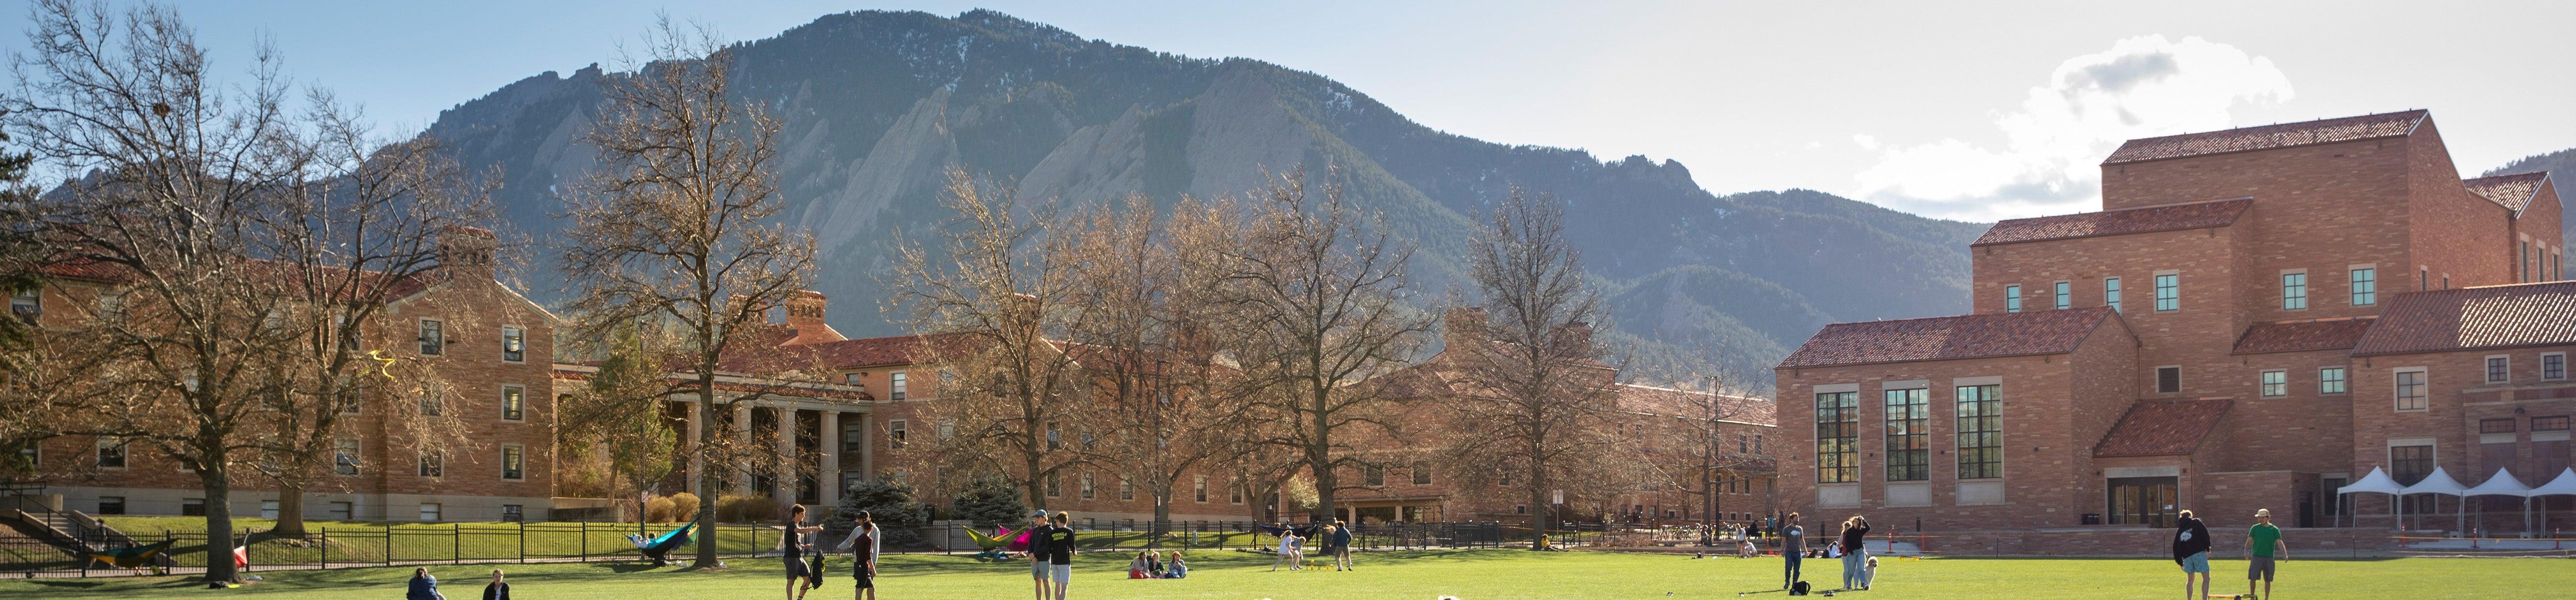 Students sitting on quad